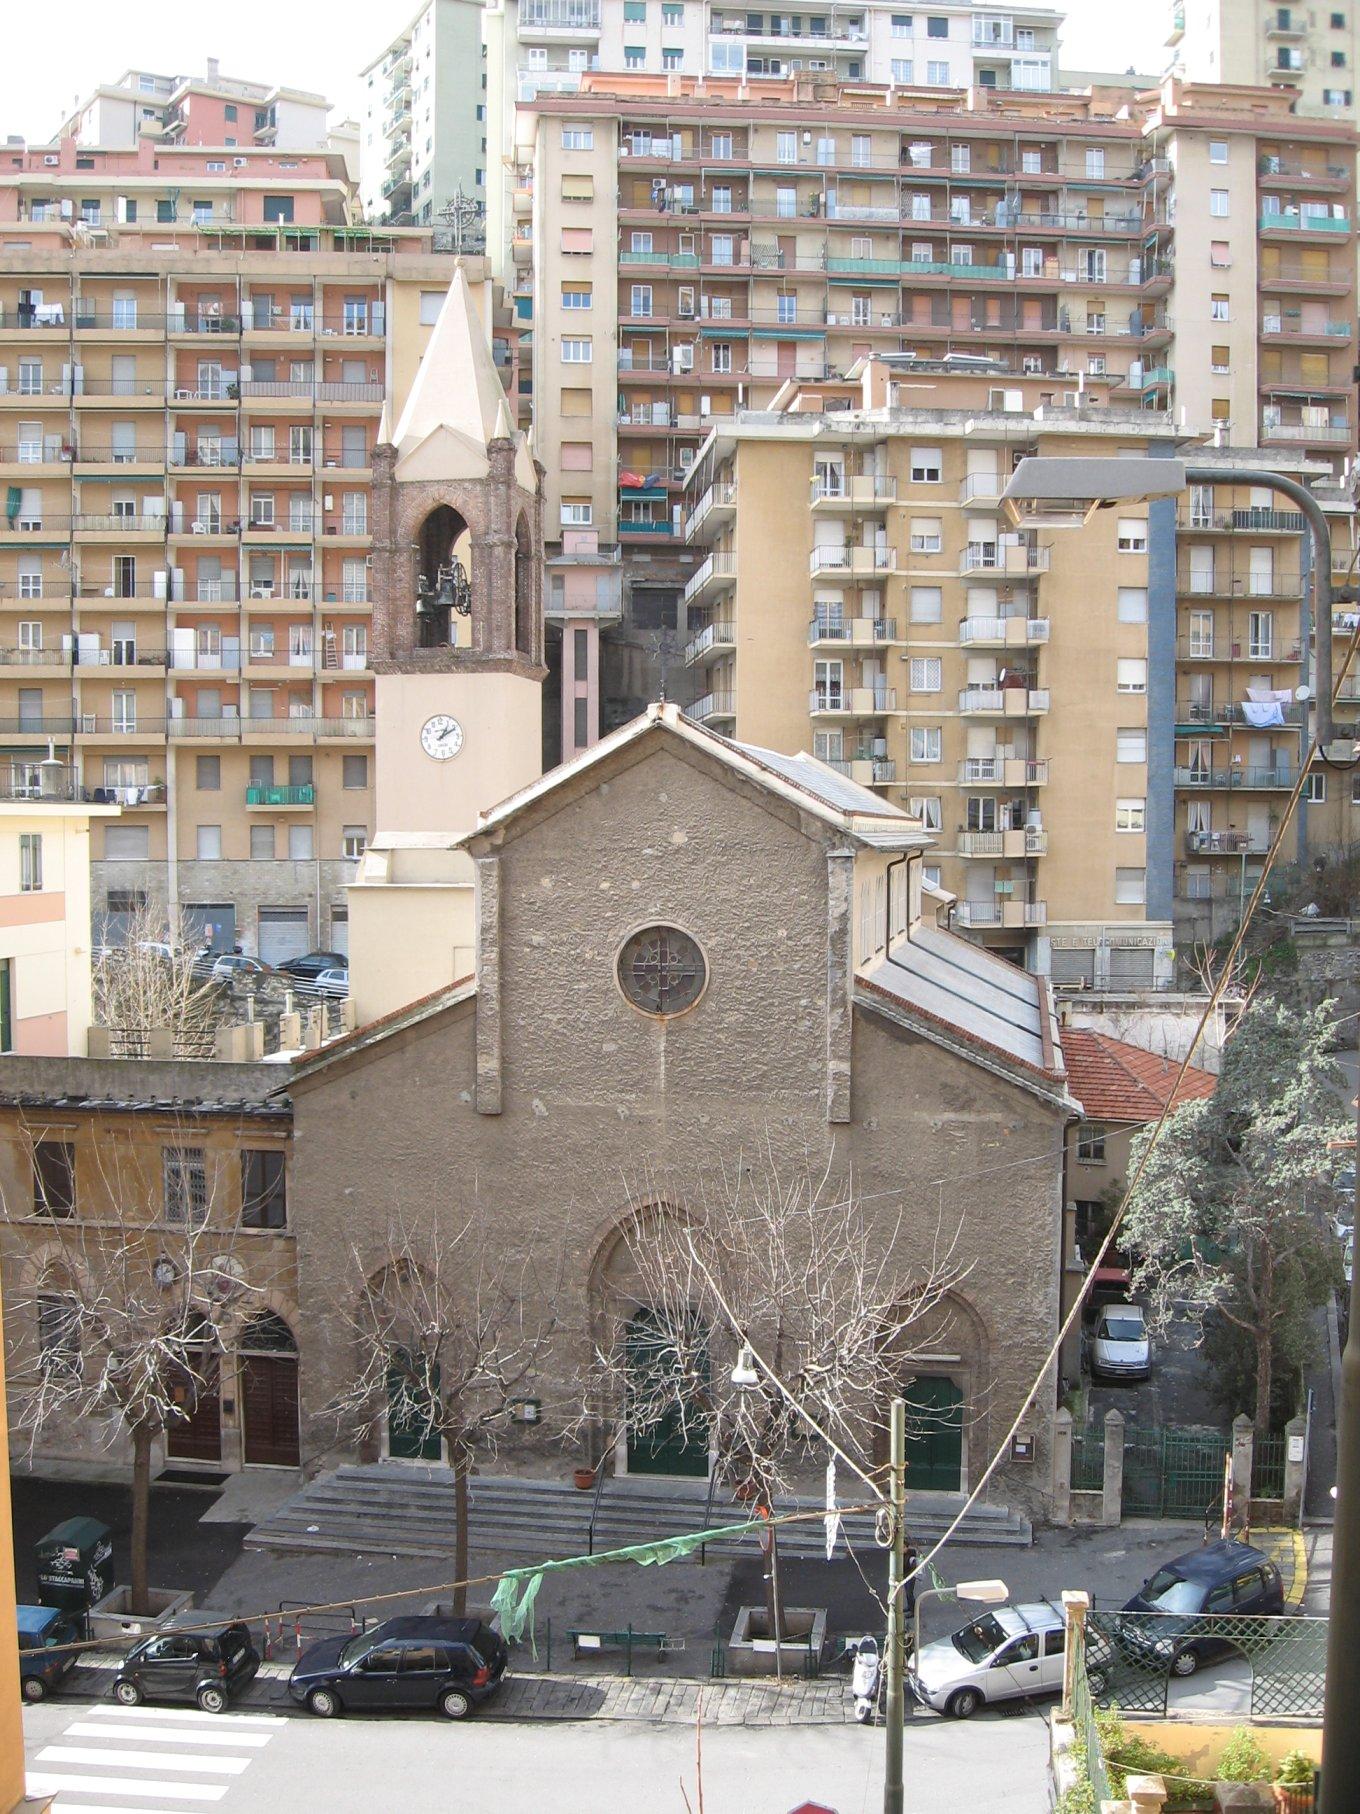 Chiesa_esterno-2009-01-27-13.11.21.jpg